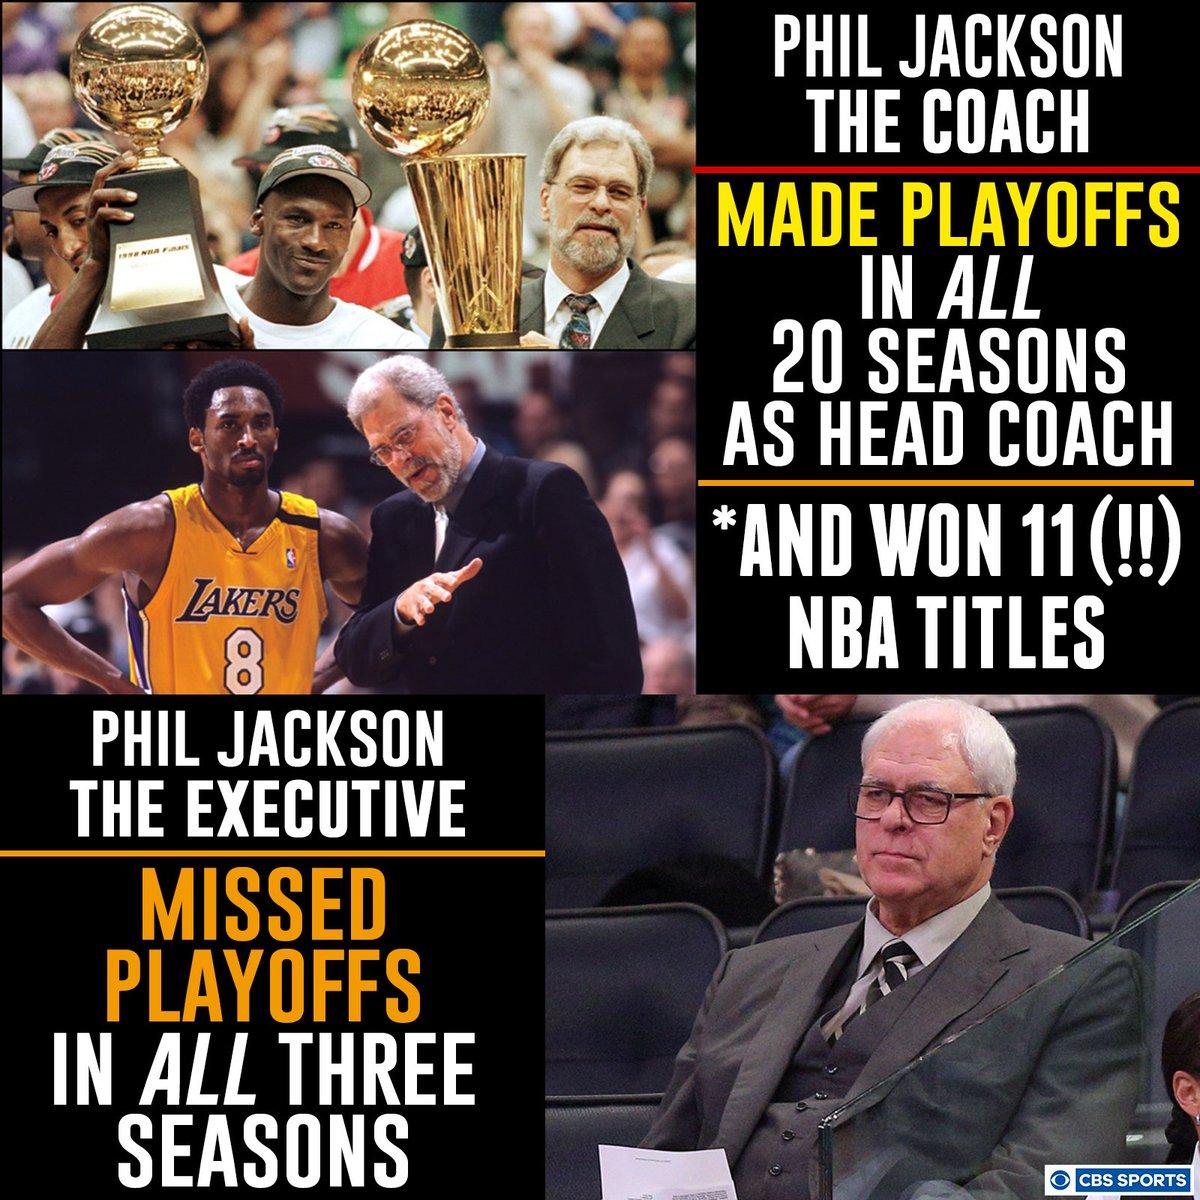 Phil the Coach: icon Phil the Executive: uhh... https://t.co/Fi8RdJqmN...